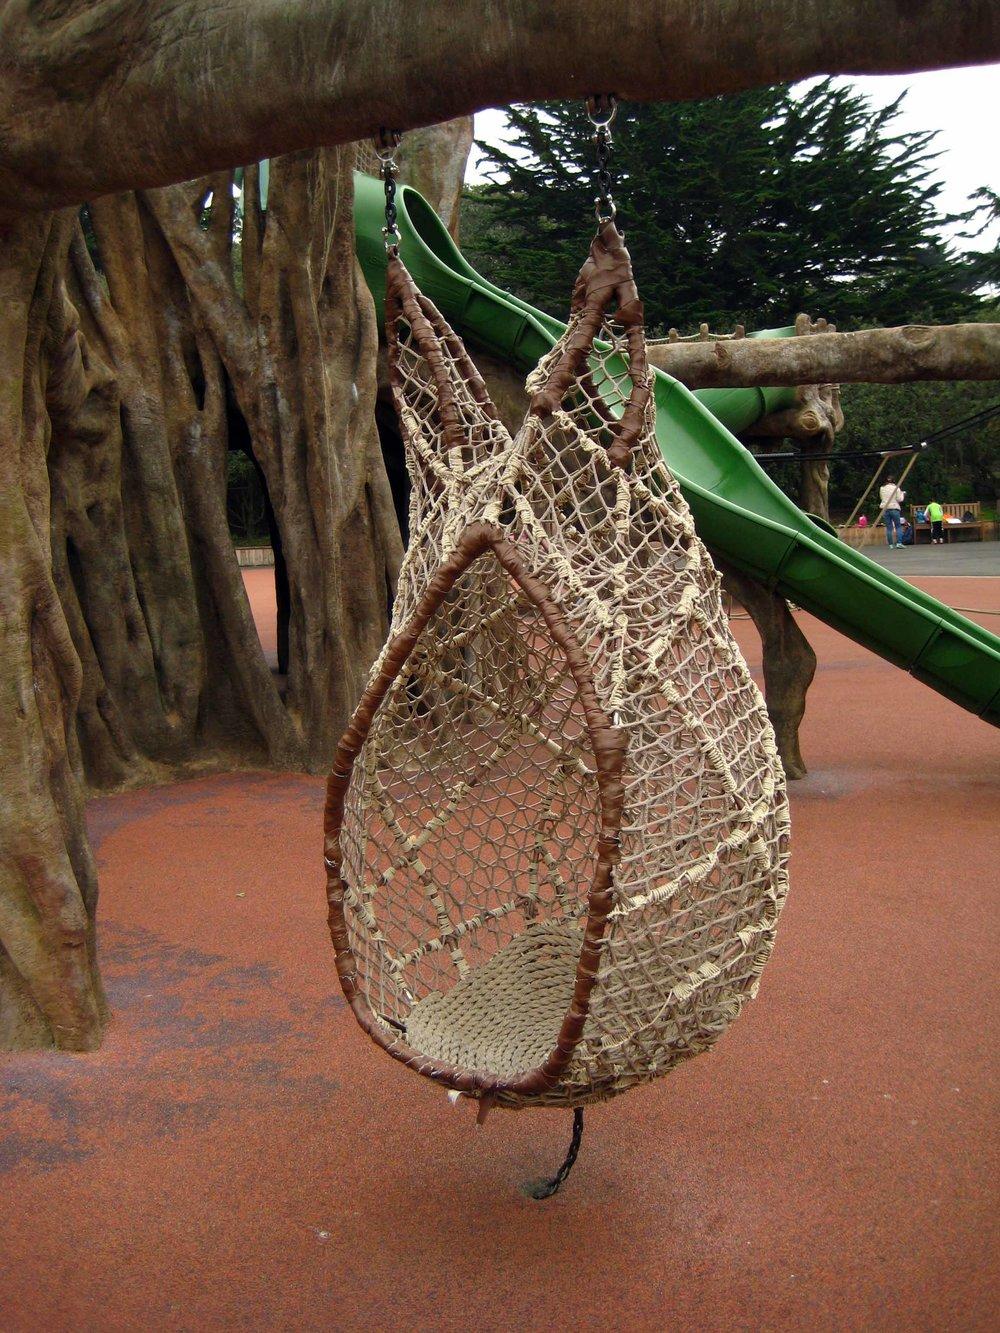 SF Zoo.Playground.Banyon Tree.IMG_1029.lo.jpg